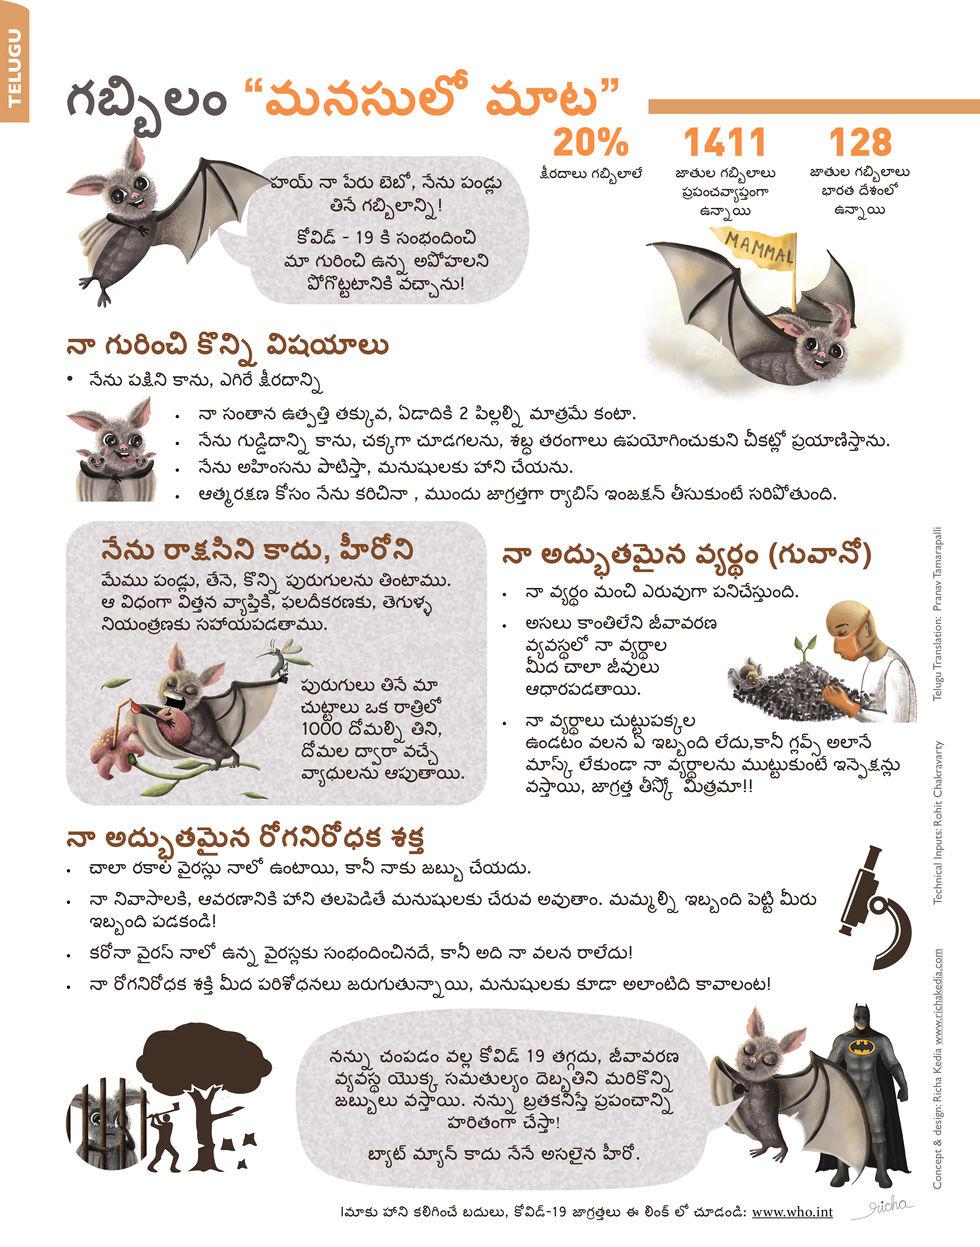 Bat Infographic Telugu.jpg